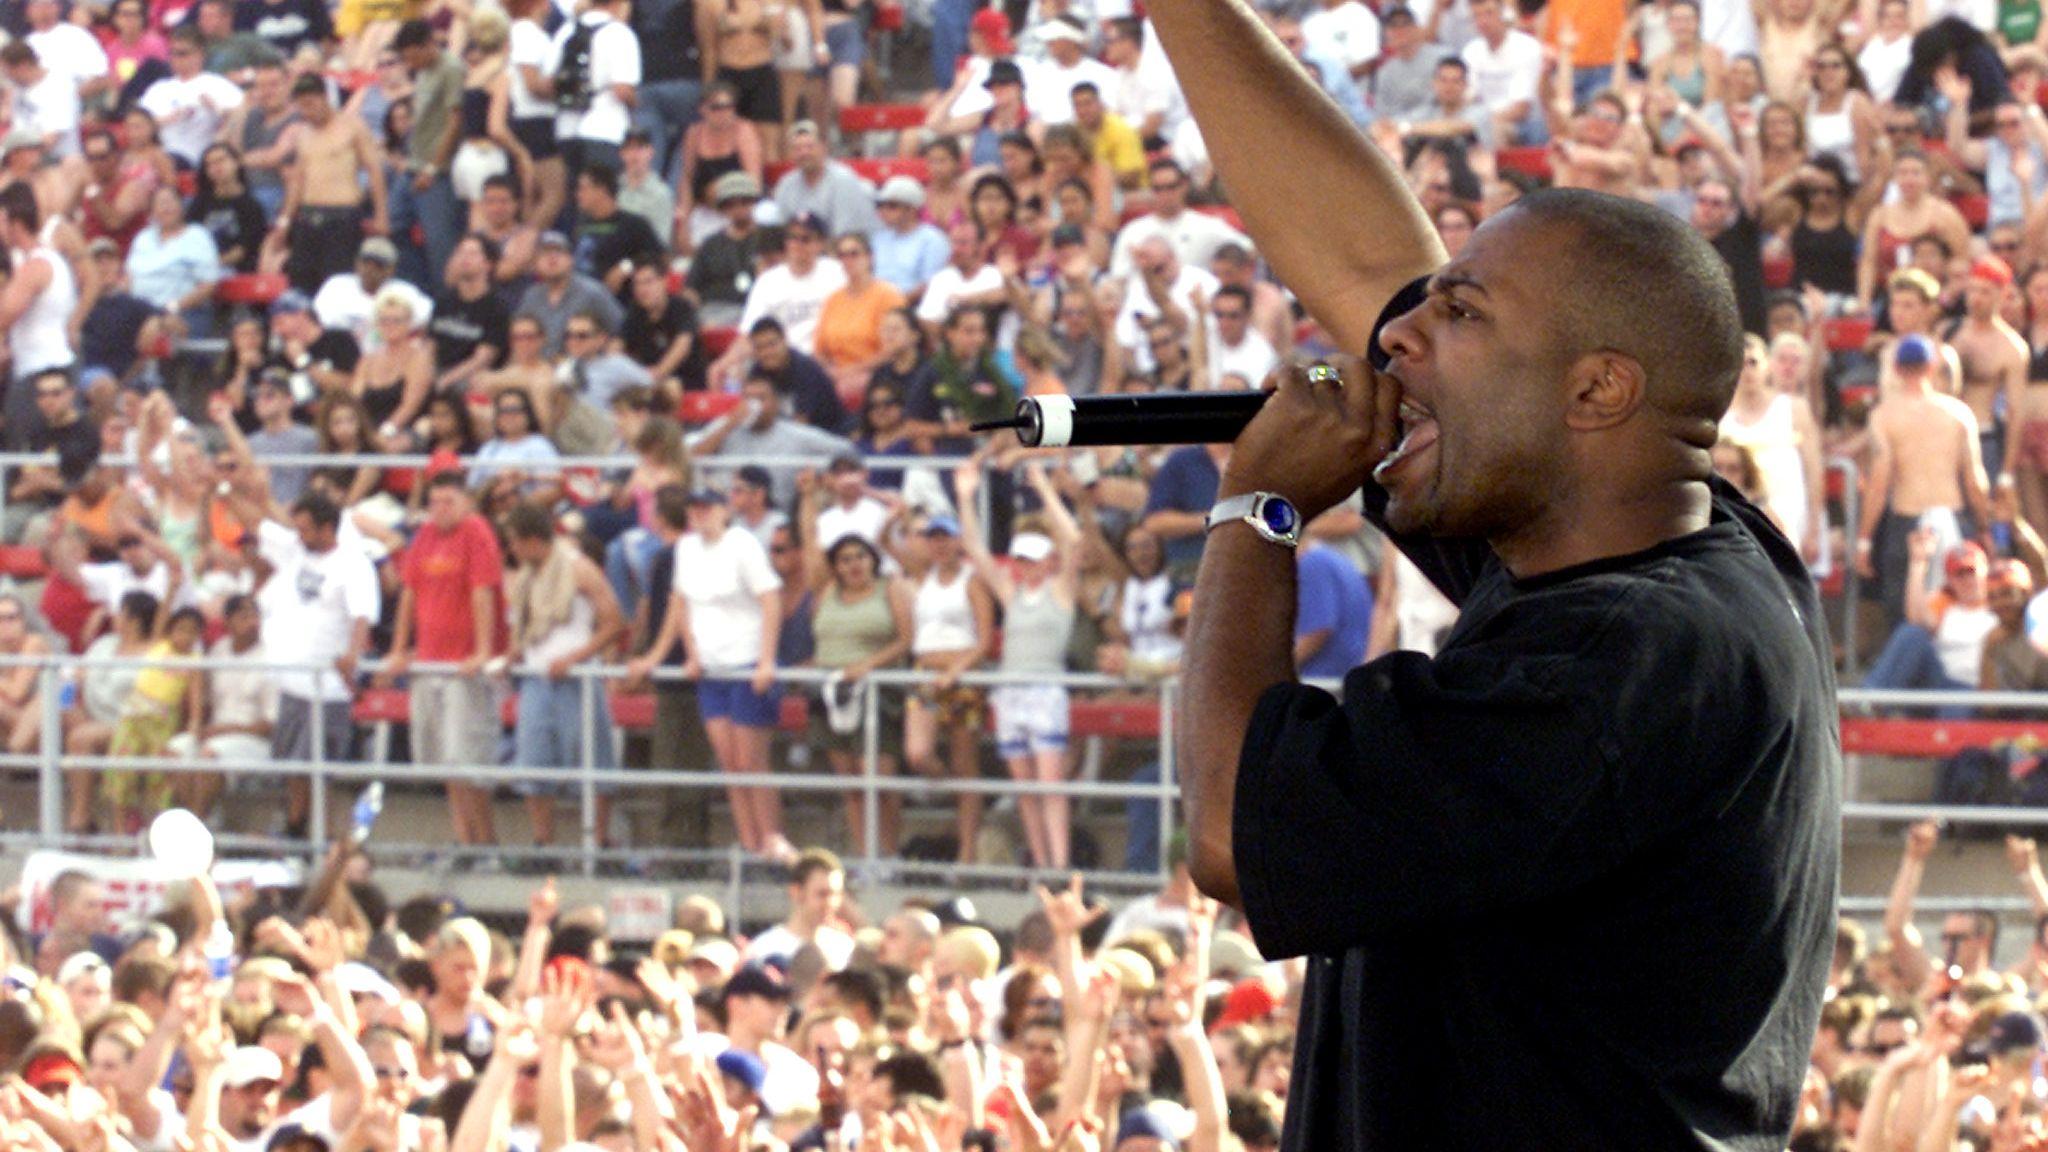 DJ Jam Master Jay performs in Las Vegas in 2001